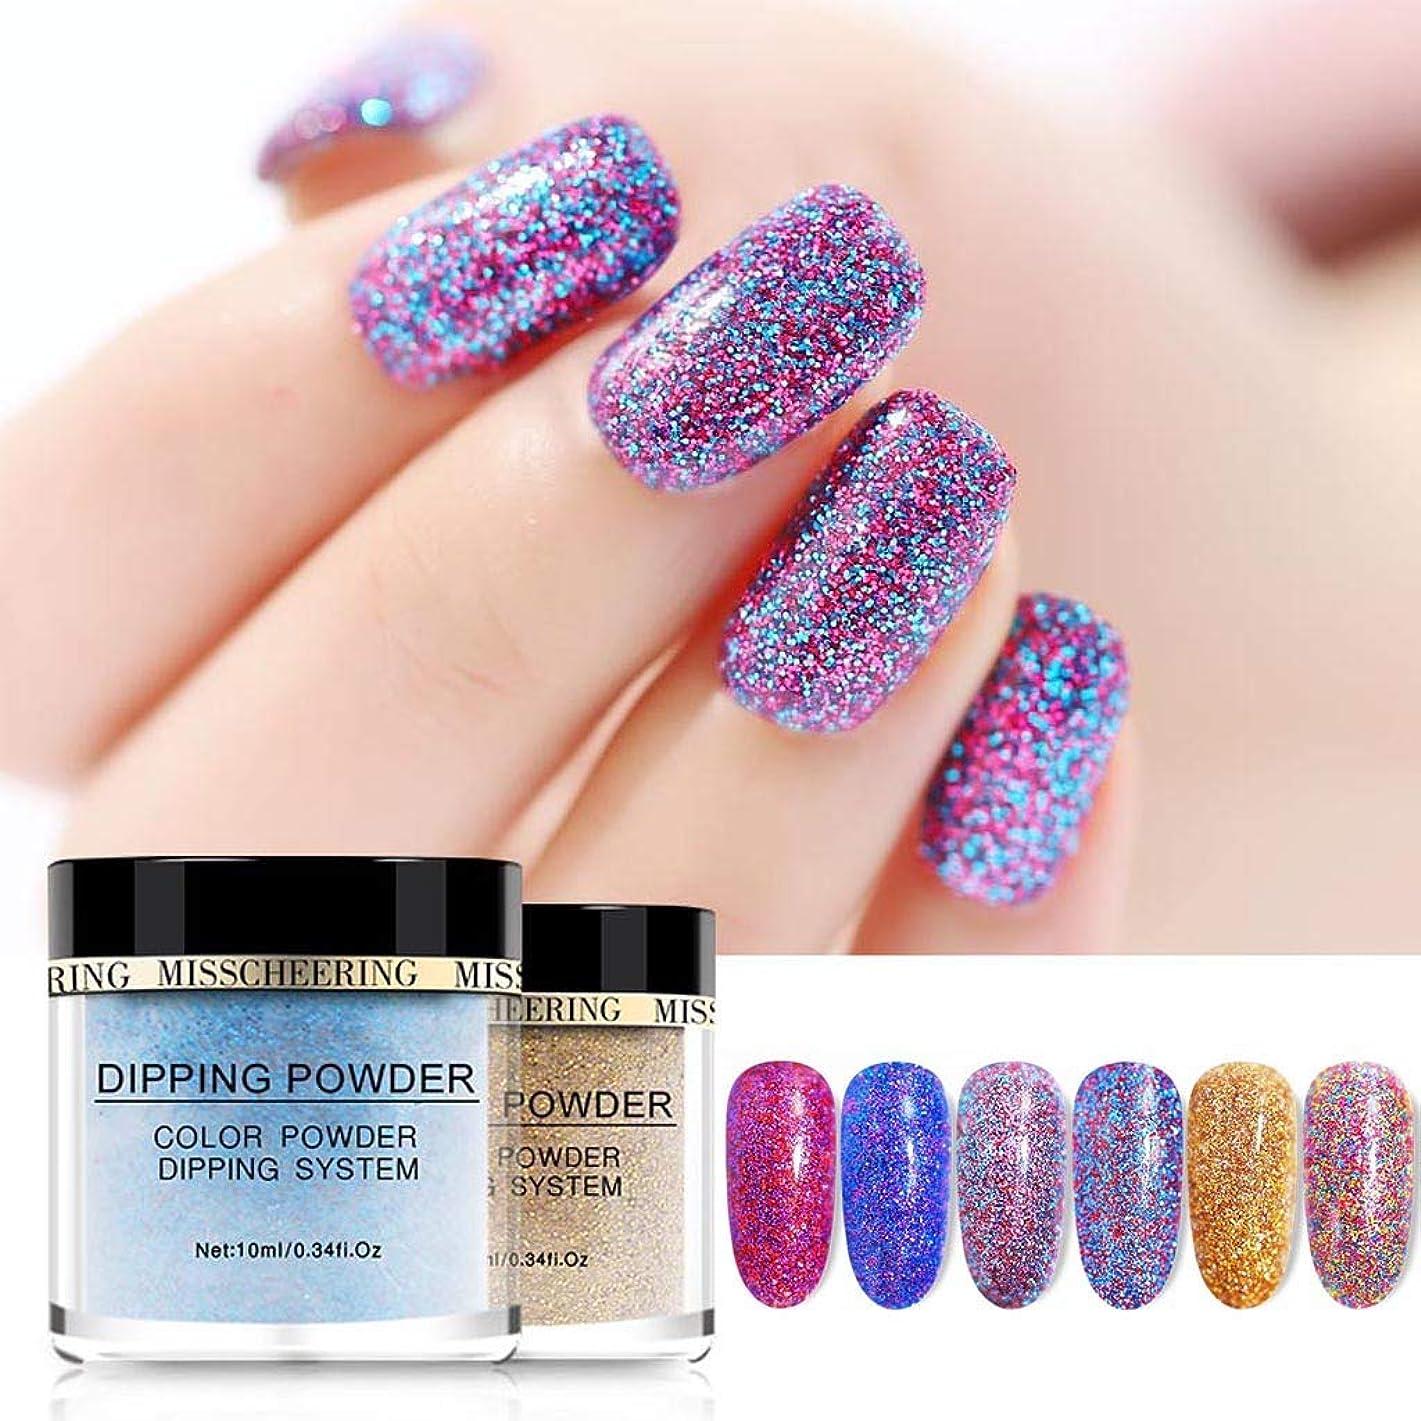 Wffo Glitter Nail Art Polymer Acrylic Powder Extension Dipping Shiny Powder Nail Art- Simple and Quick to Apply, More Durable Than Nail Polish-12 Colors Optional (G)